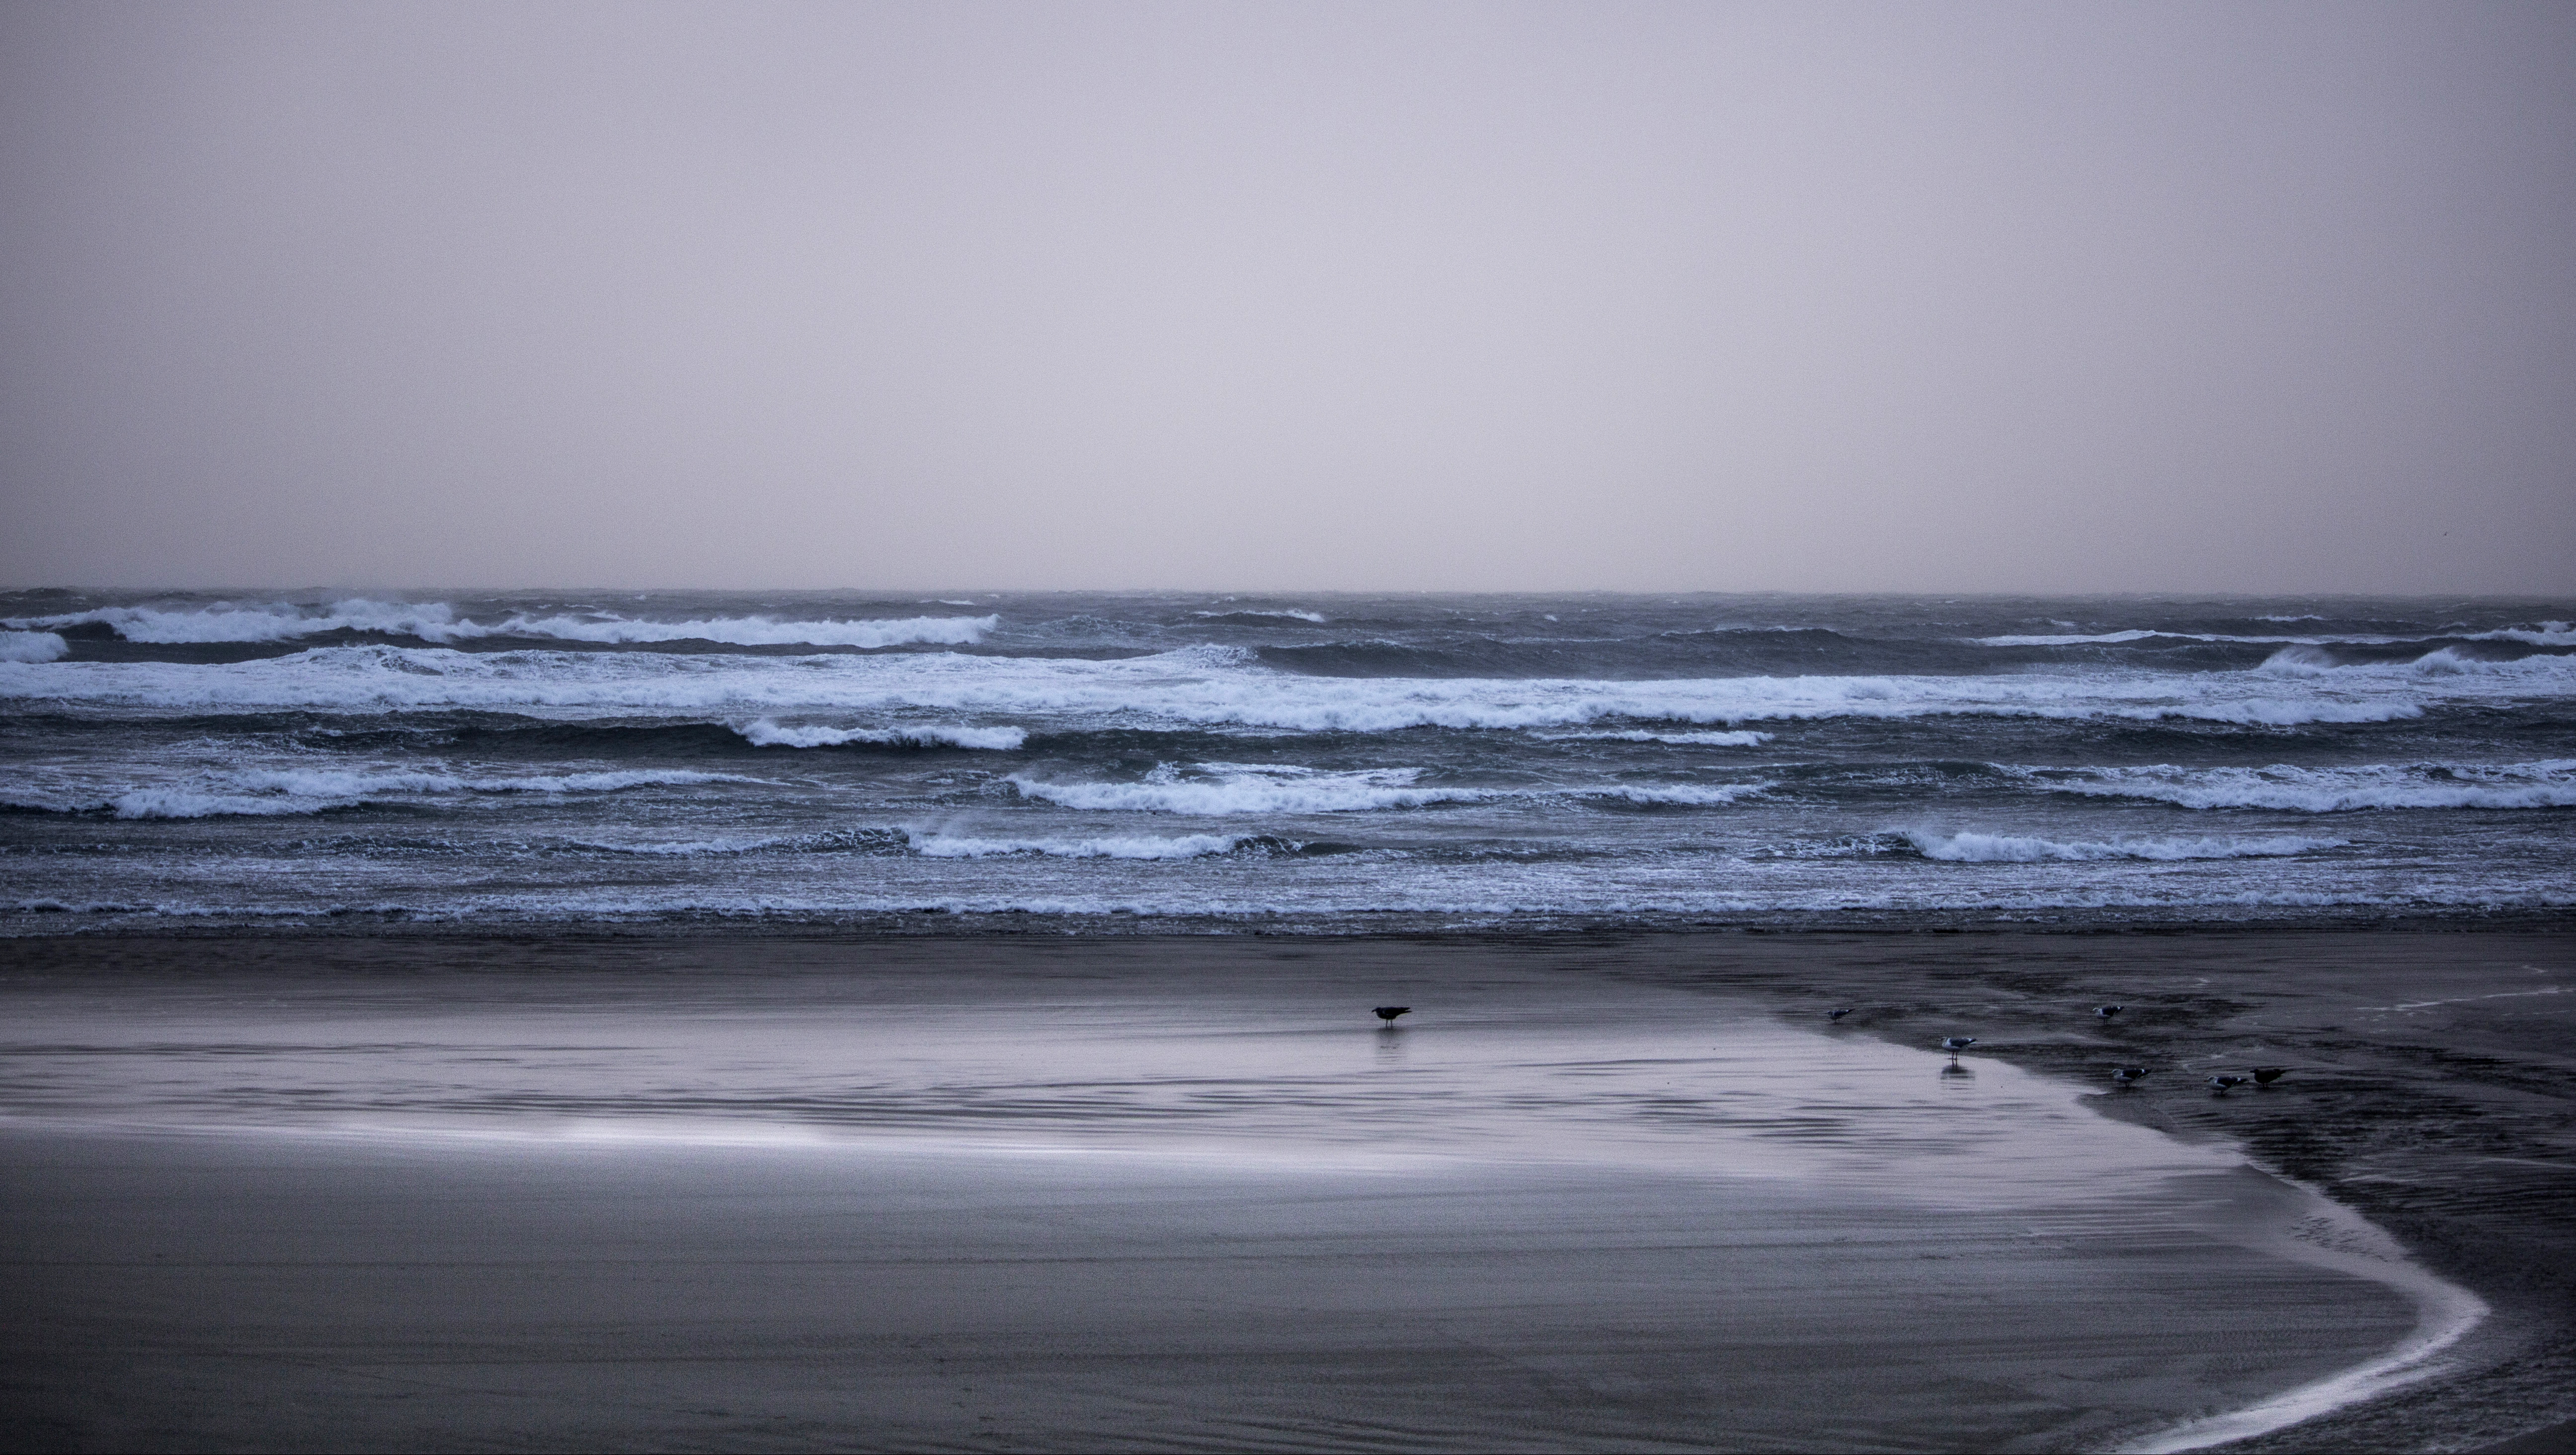 Sunset at nye beach, oregon photo